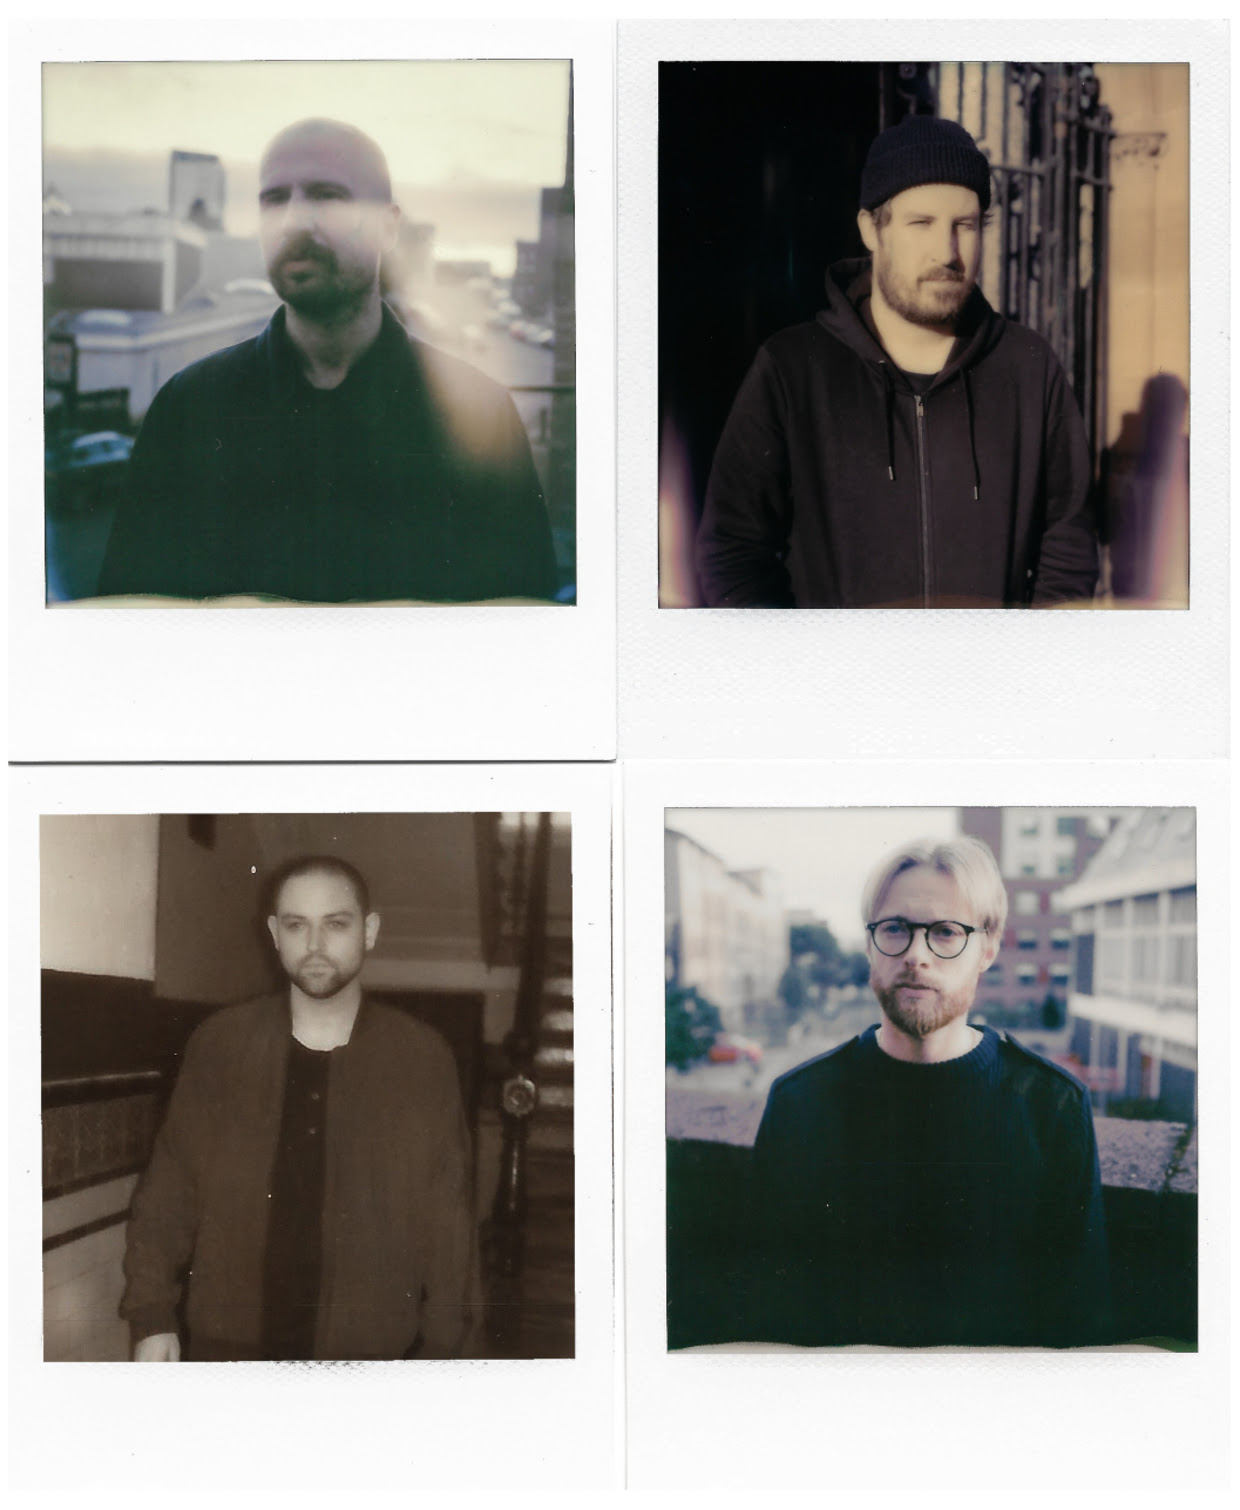 twilight sad videograms new album